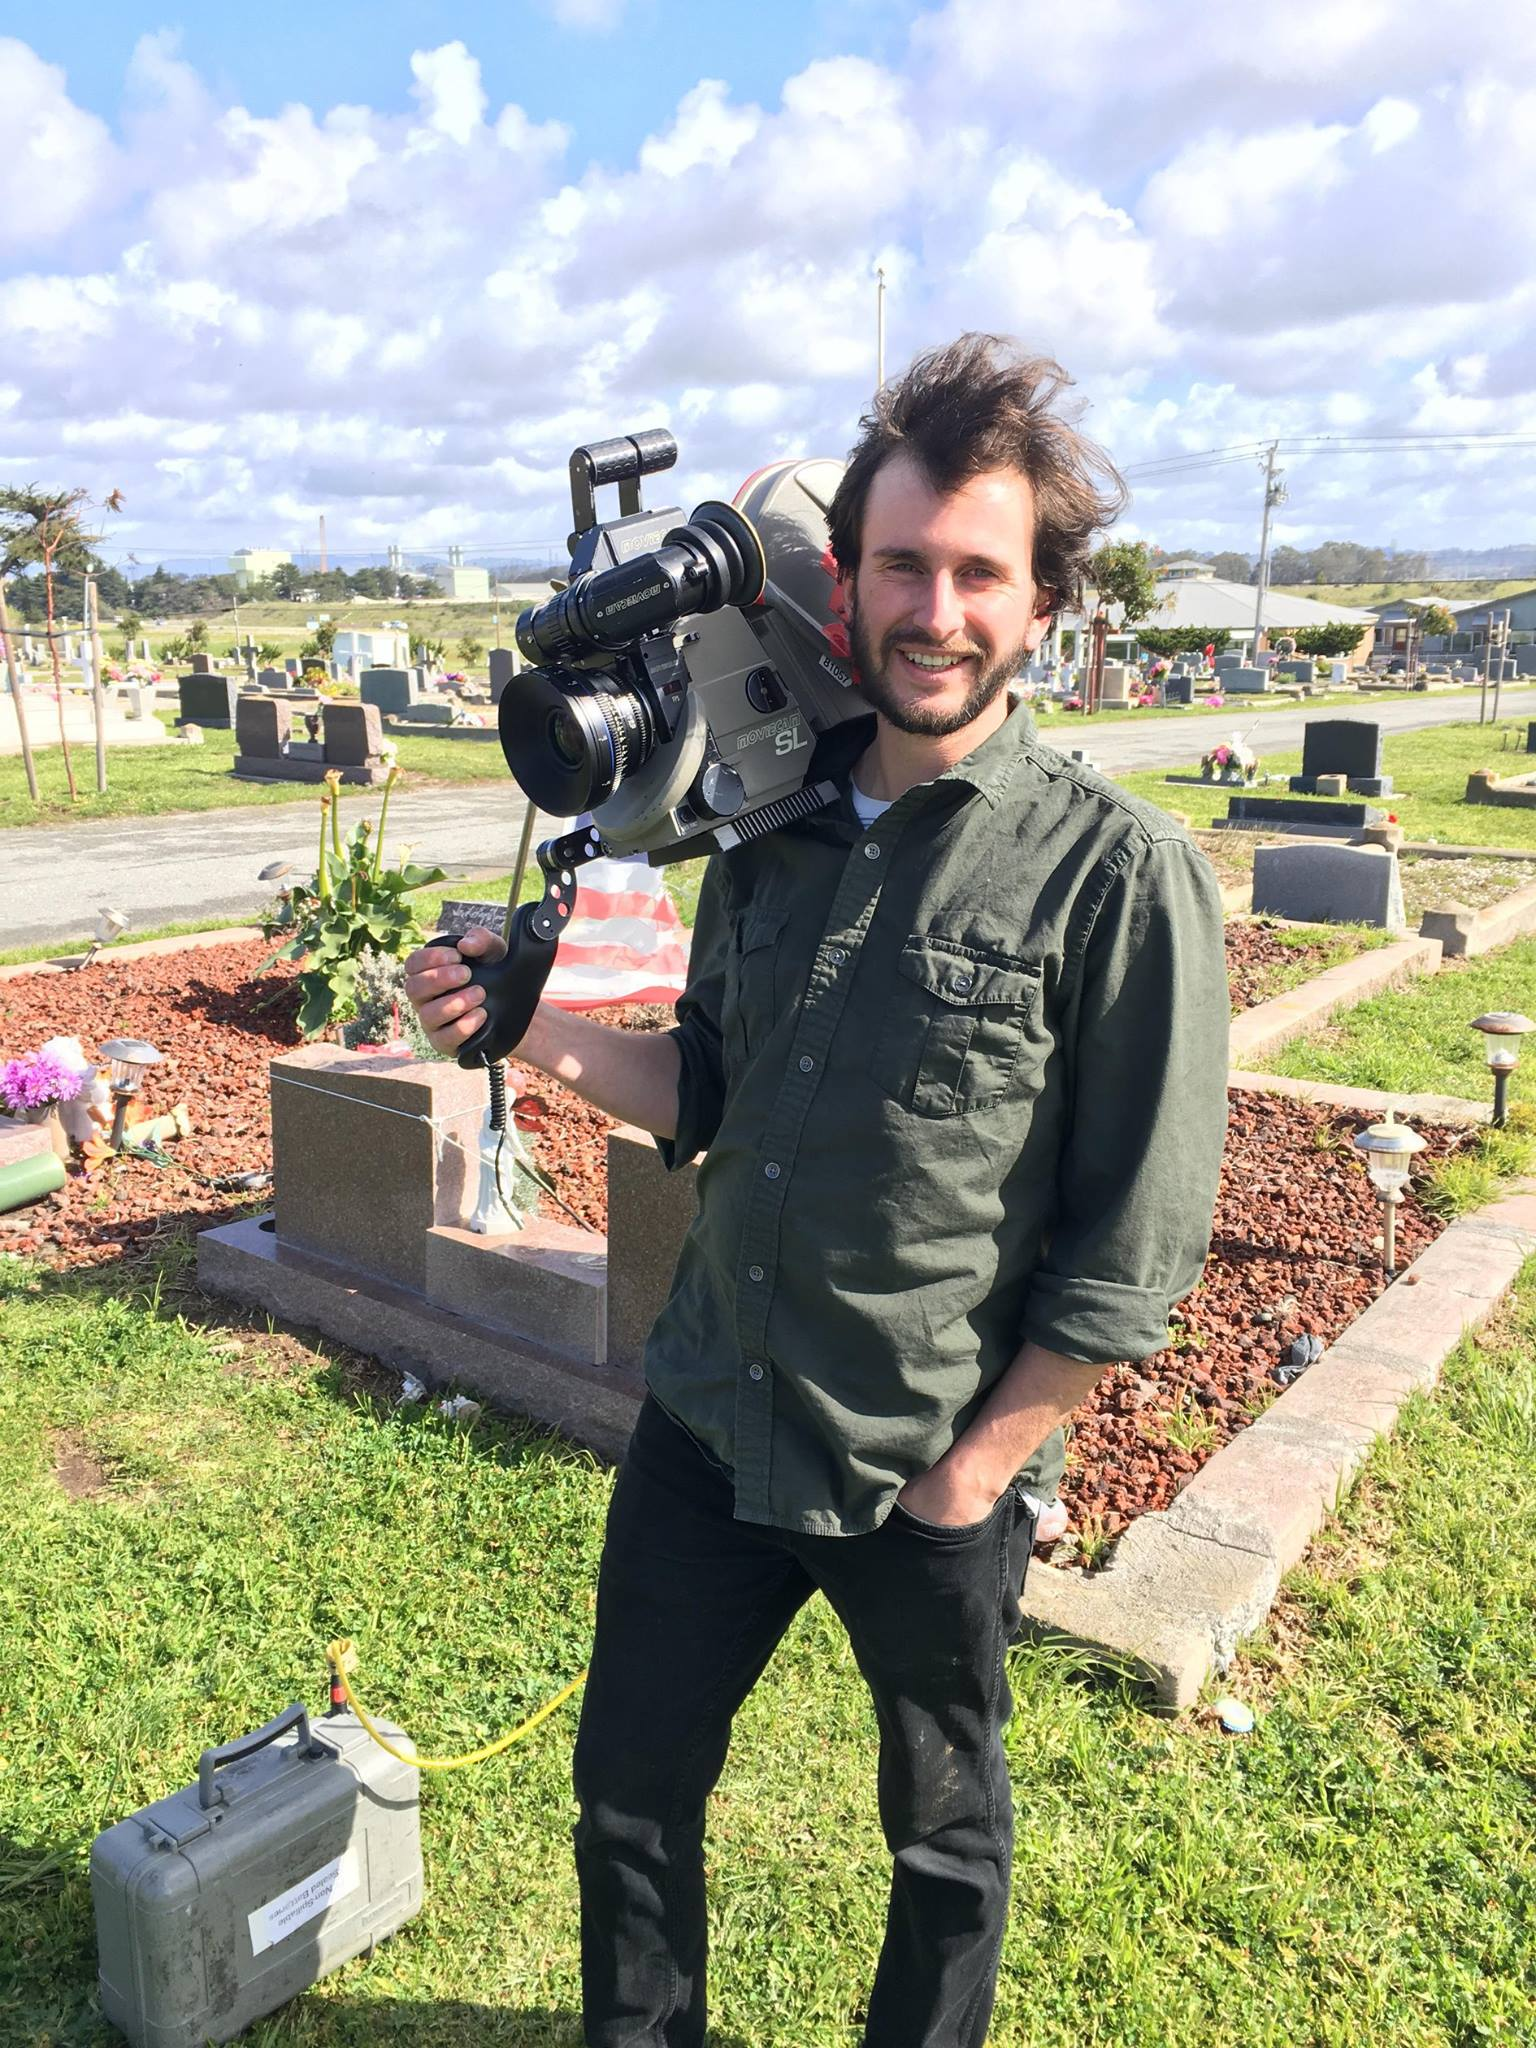 Cinematographer- Dan Muchnik